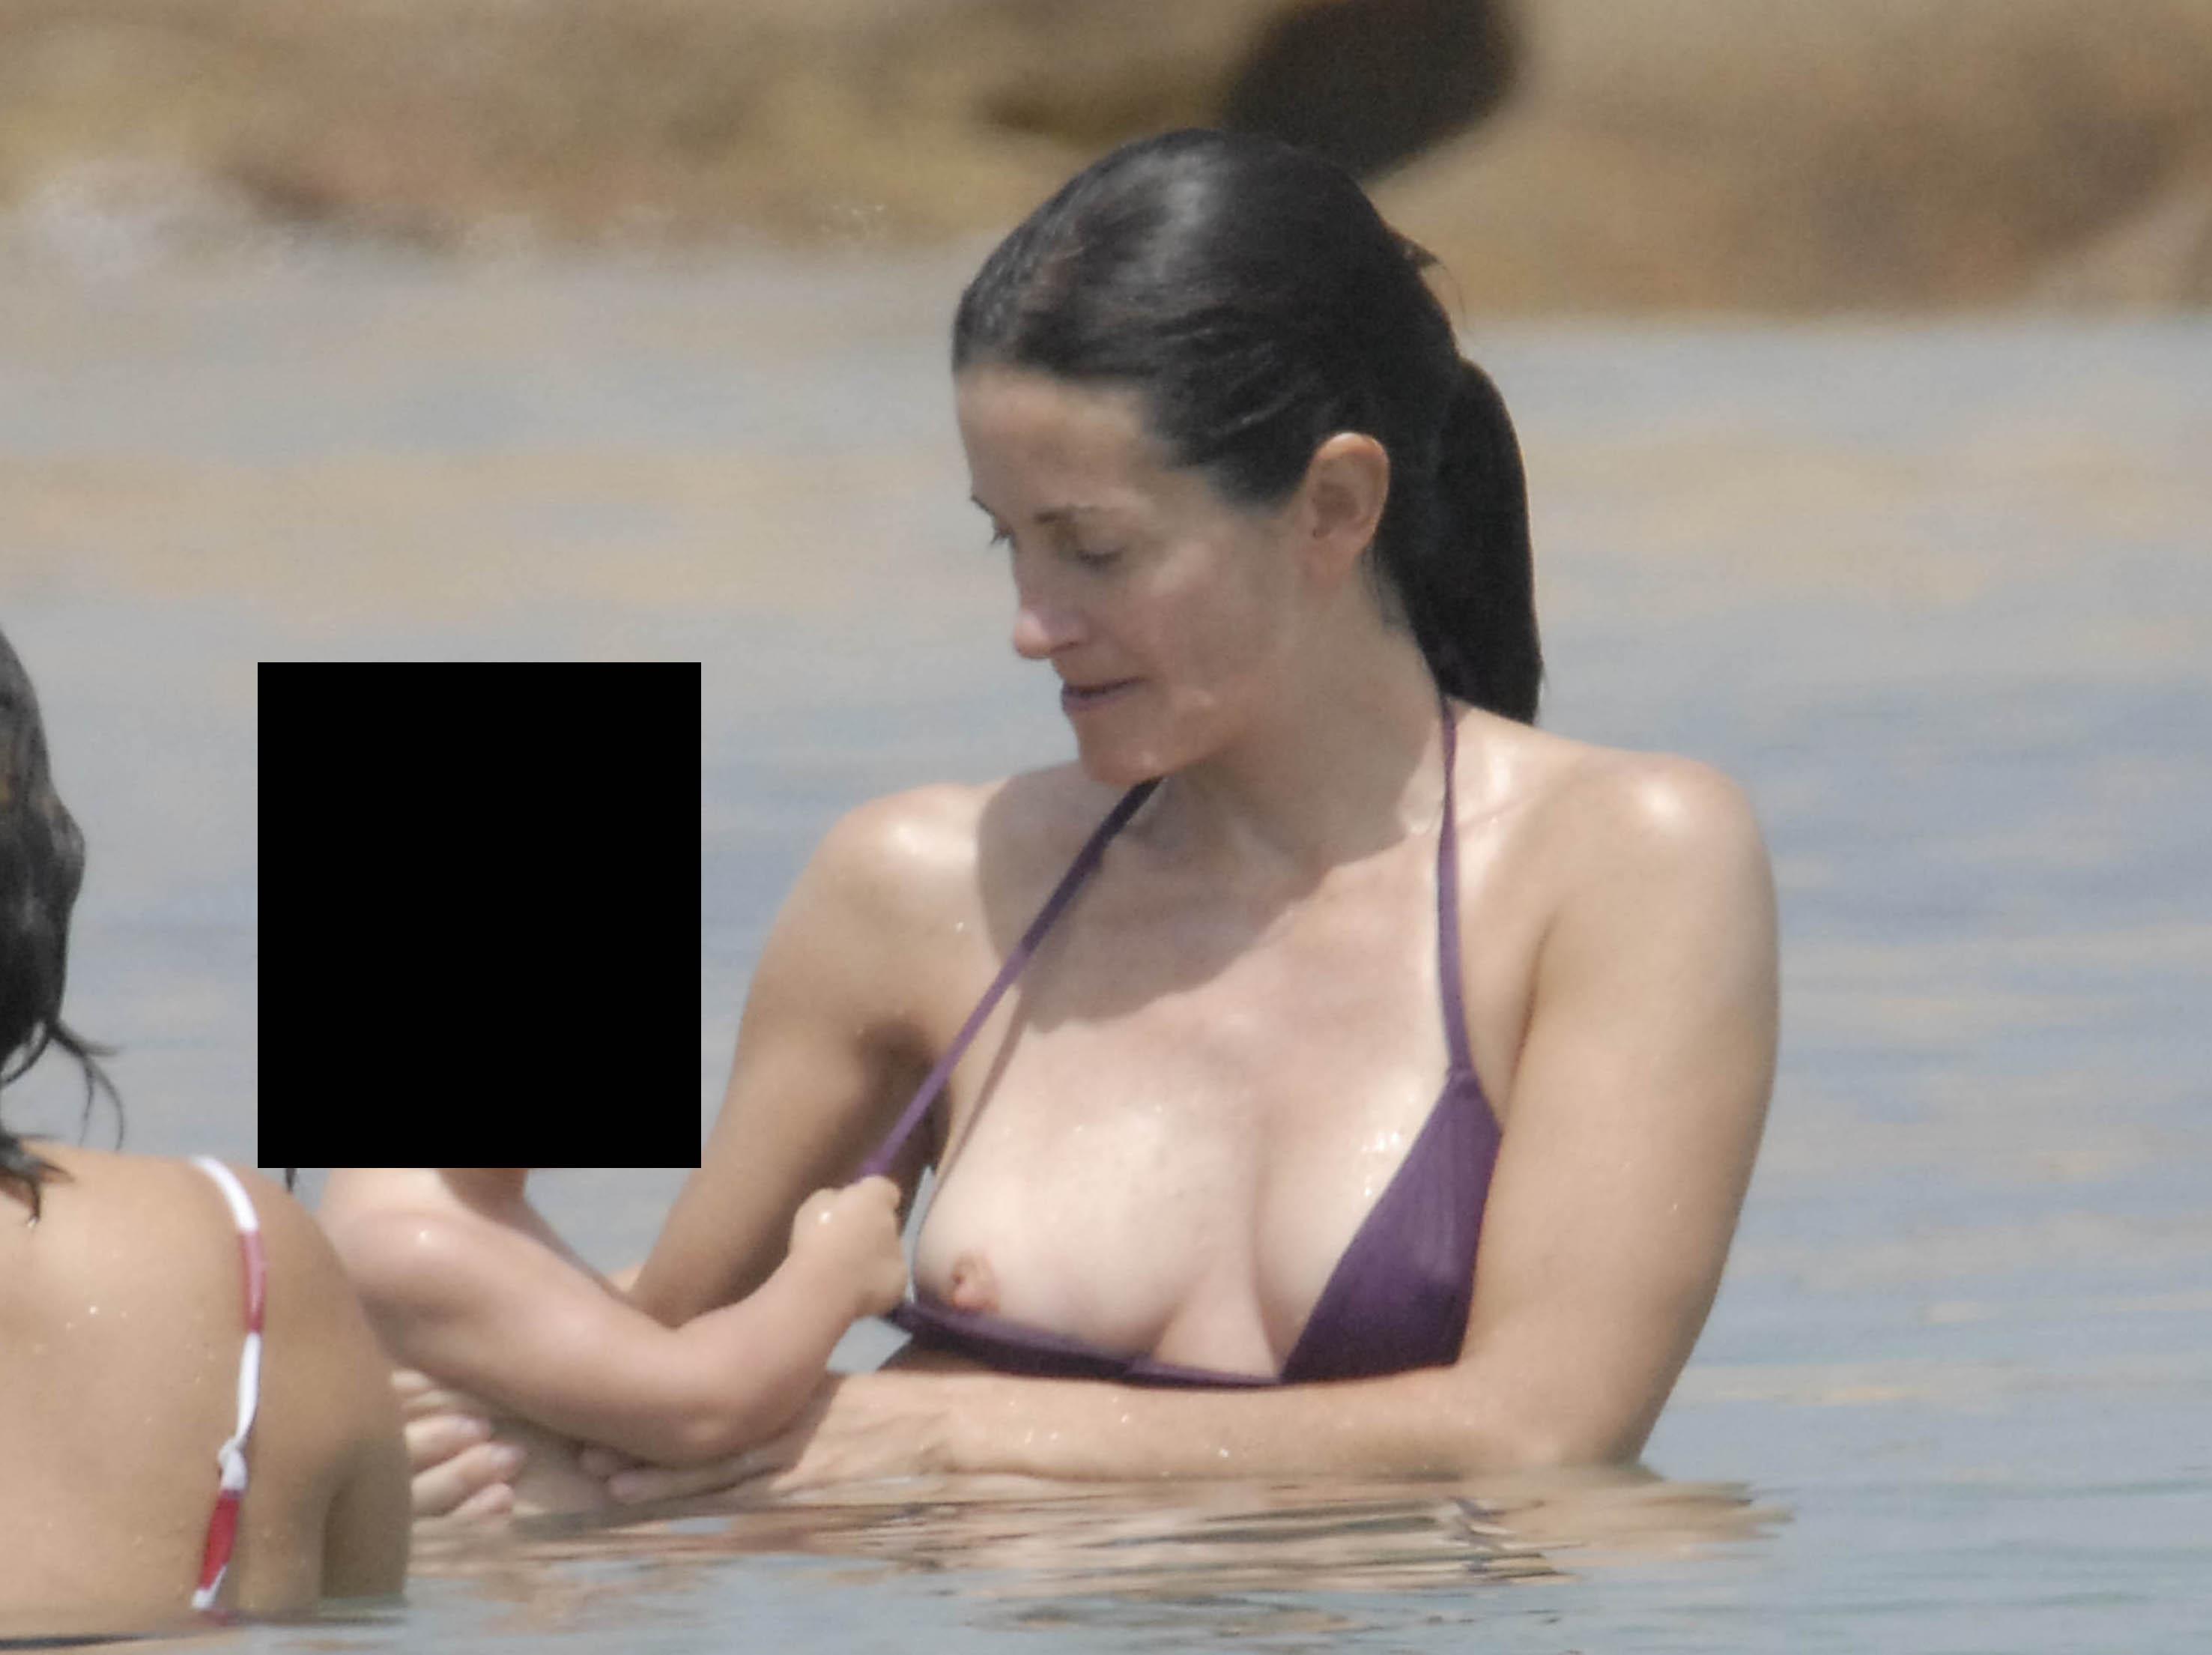 Courtney cox nipple slip would